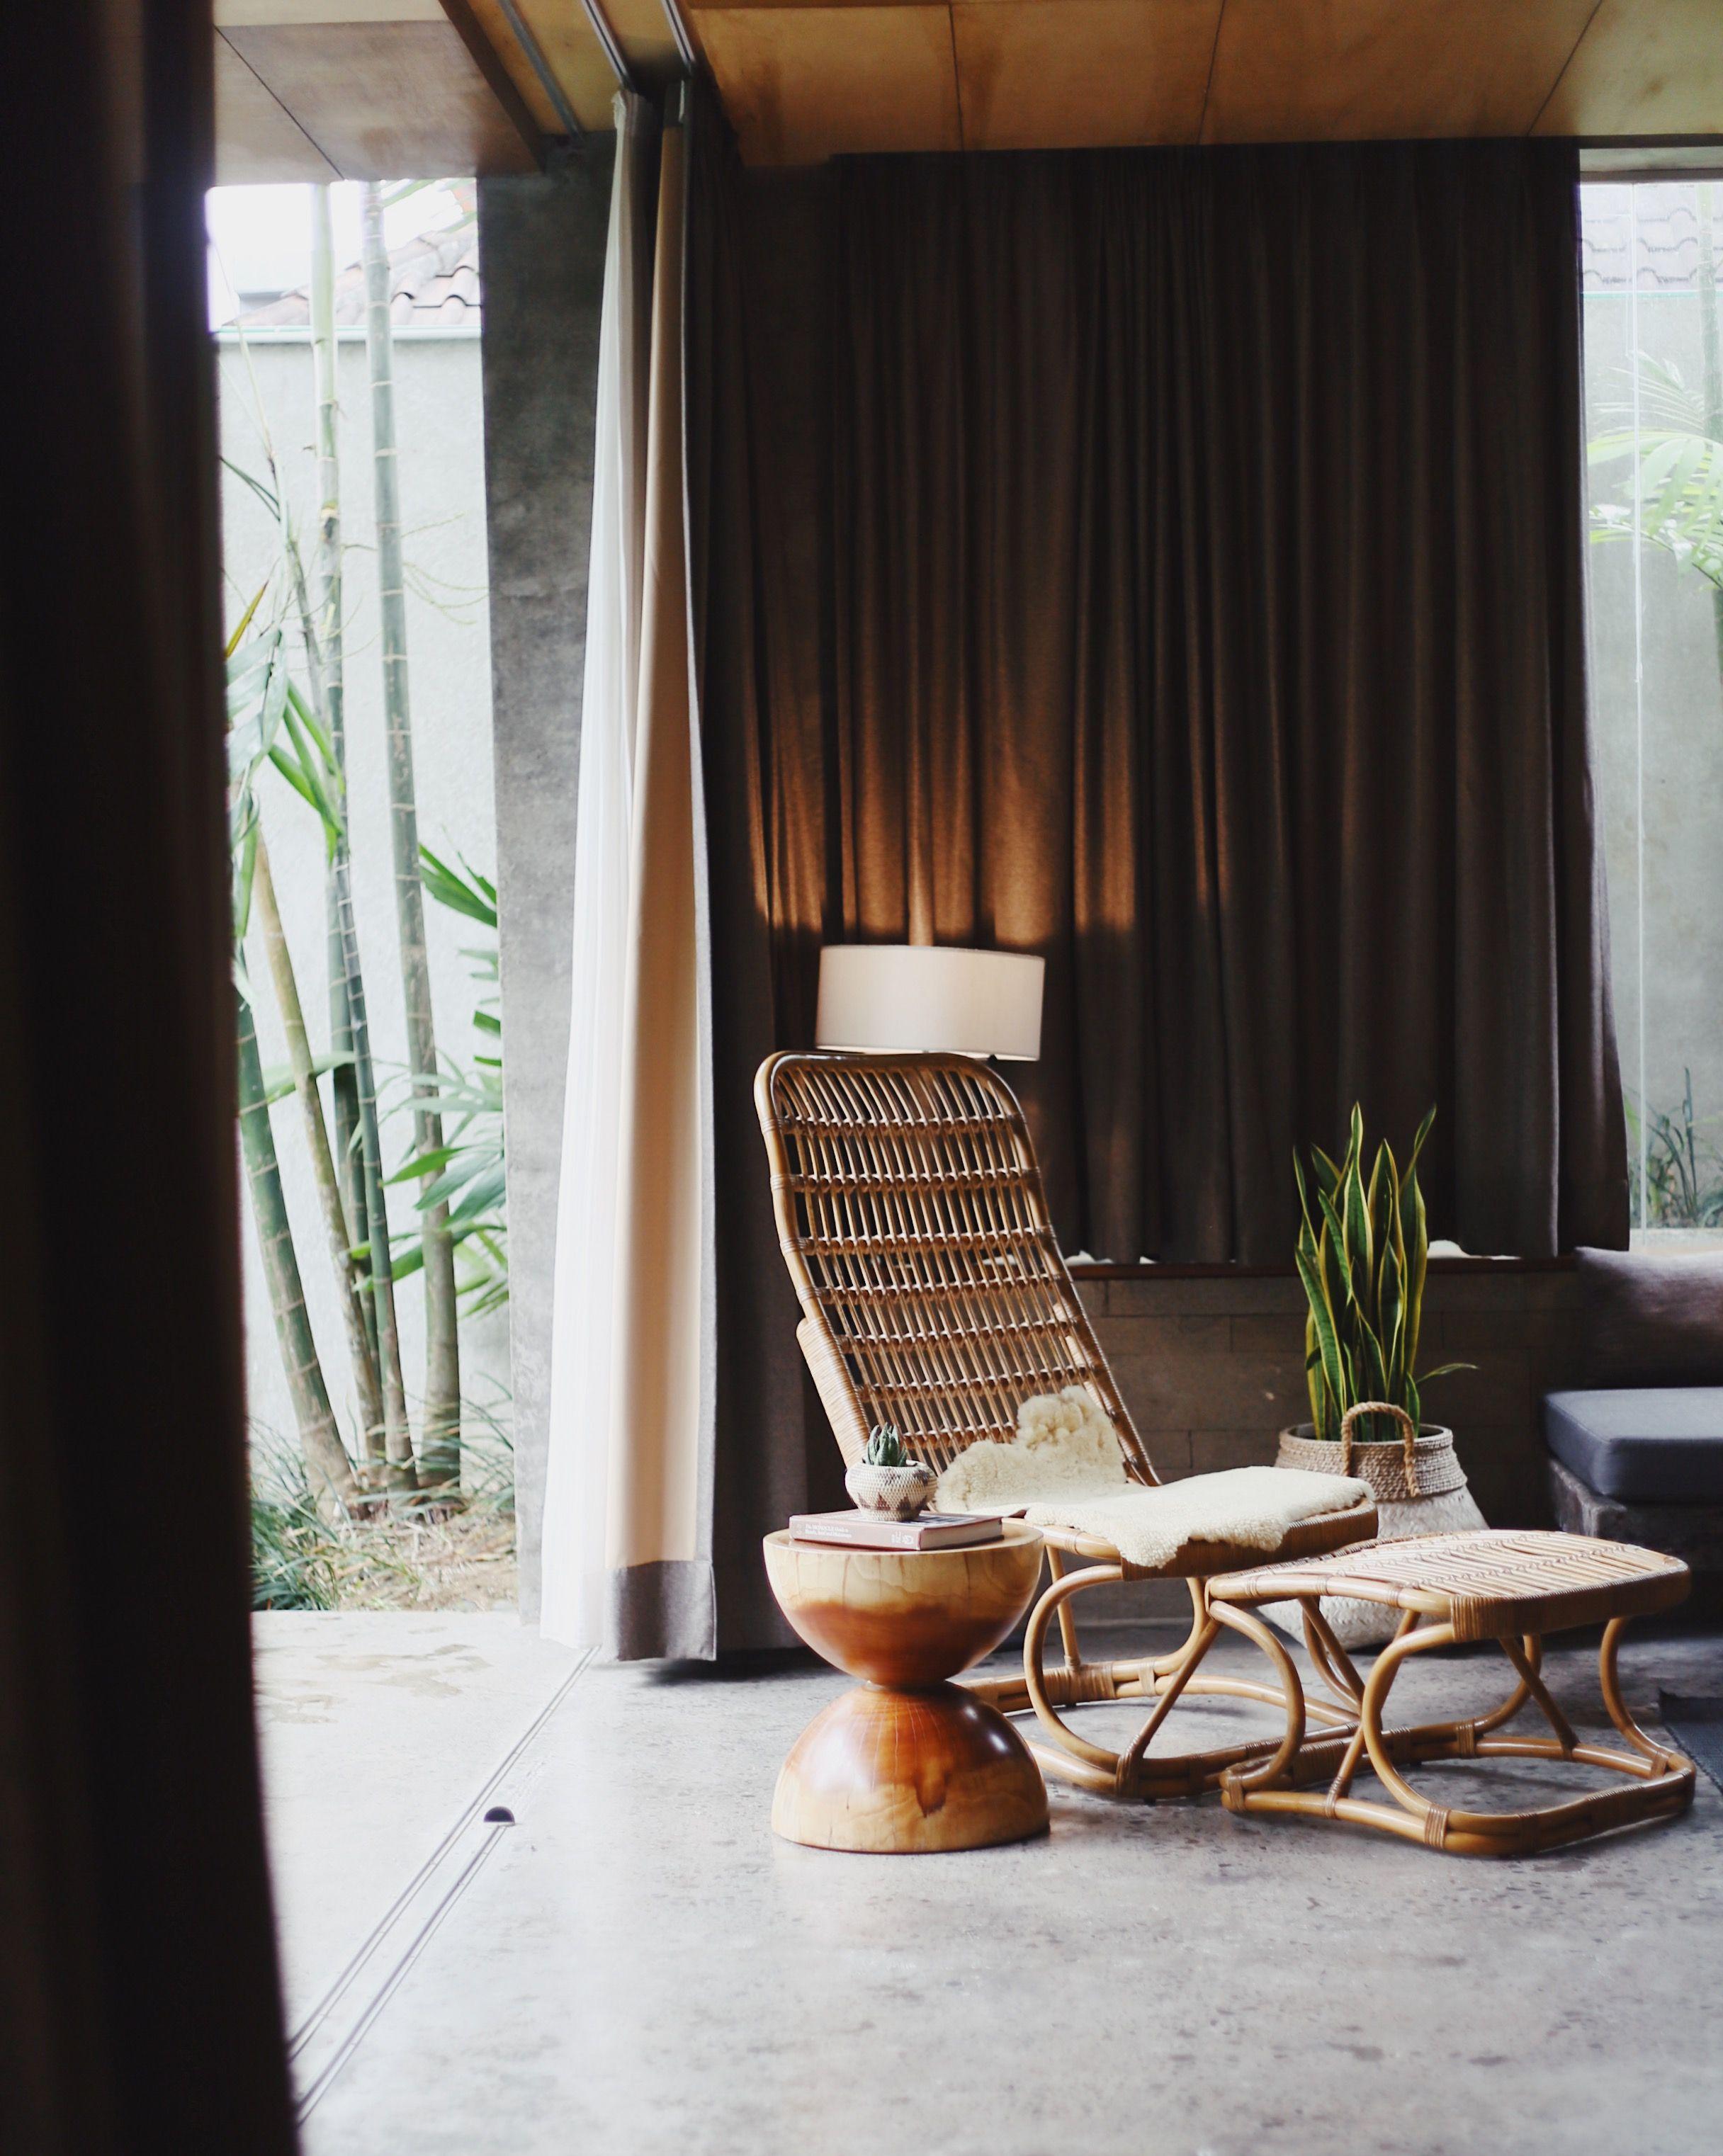 The Slow, Canggu, Bali, Indonesia, natural, organic interior